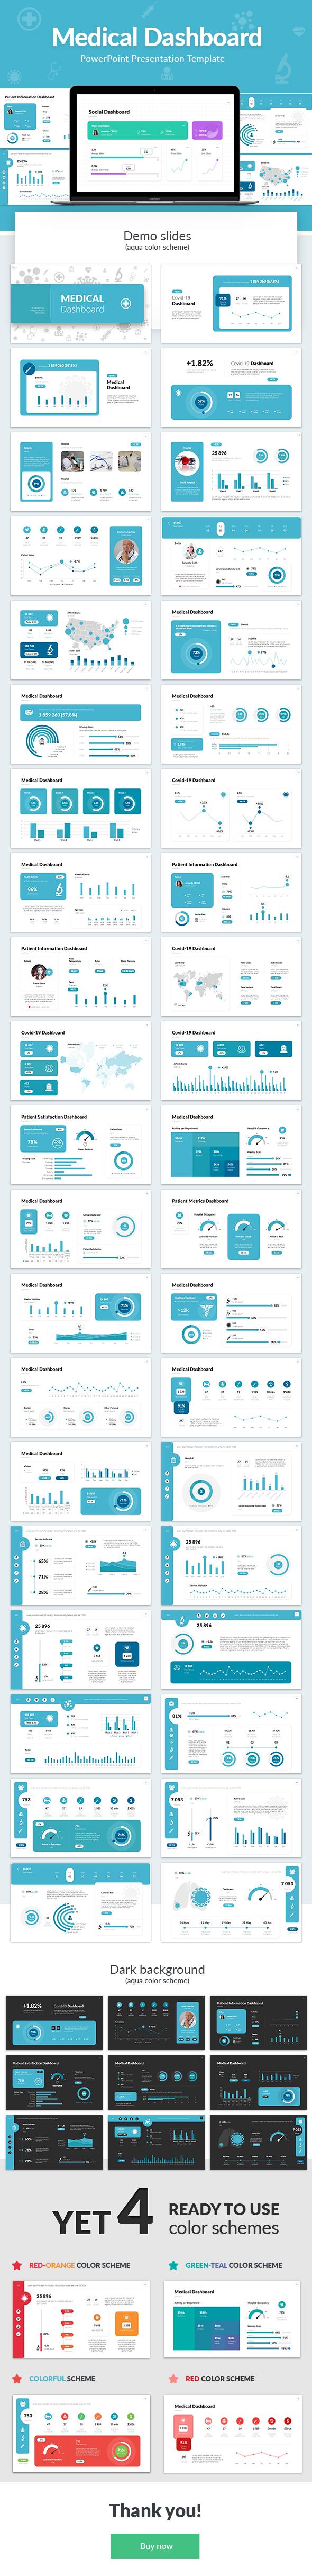 Medical Dashboard PowerPoint Presentation Template